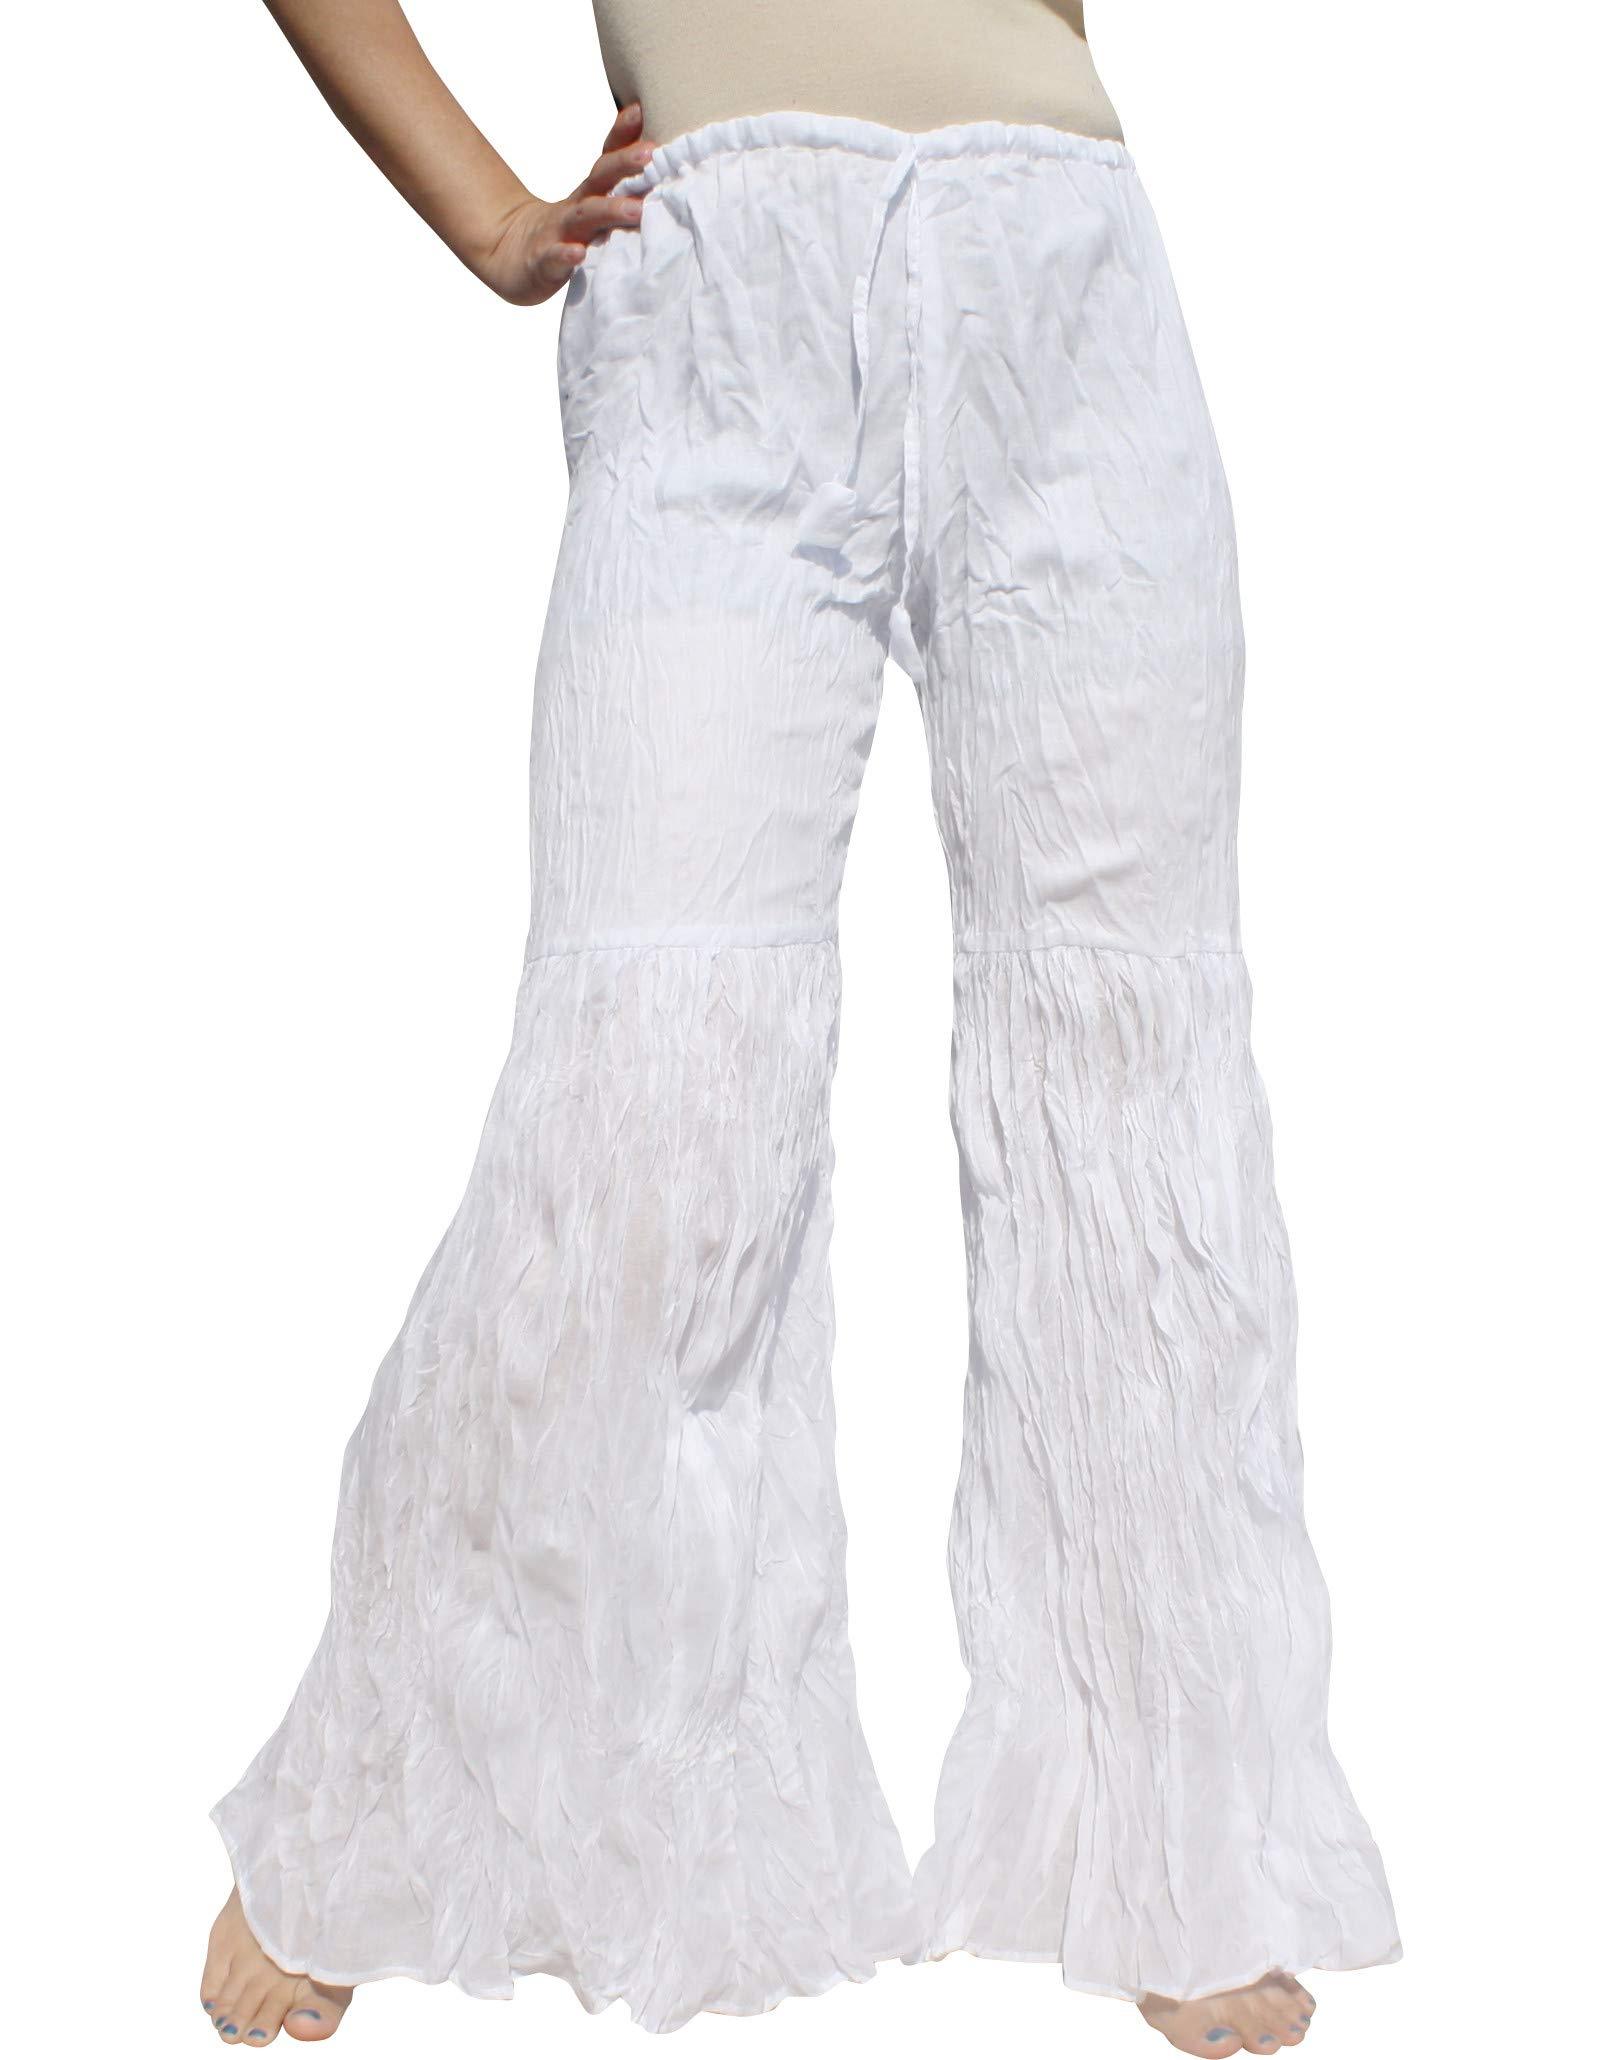 Raan Pah Muang Brand Wide Lower Leg Flared Light Cotton Stepped Pants Baggy Cut, Medium, White by Raan Pah Muang